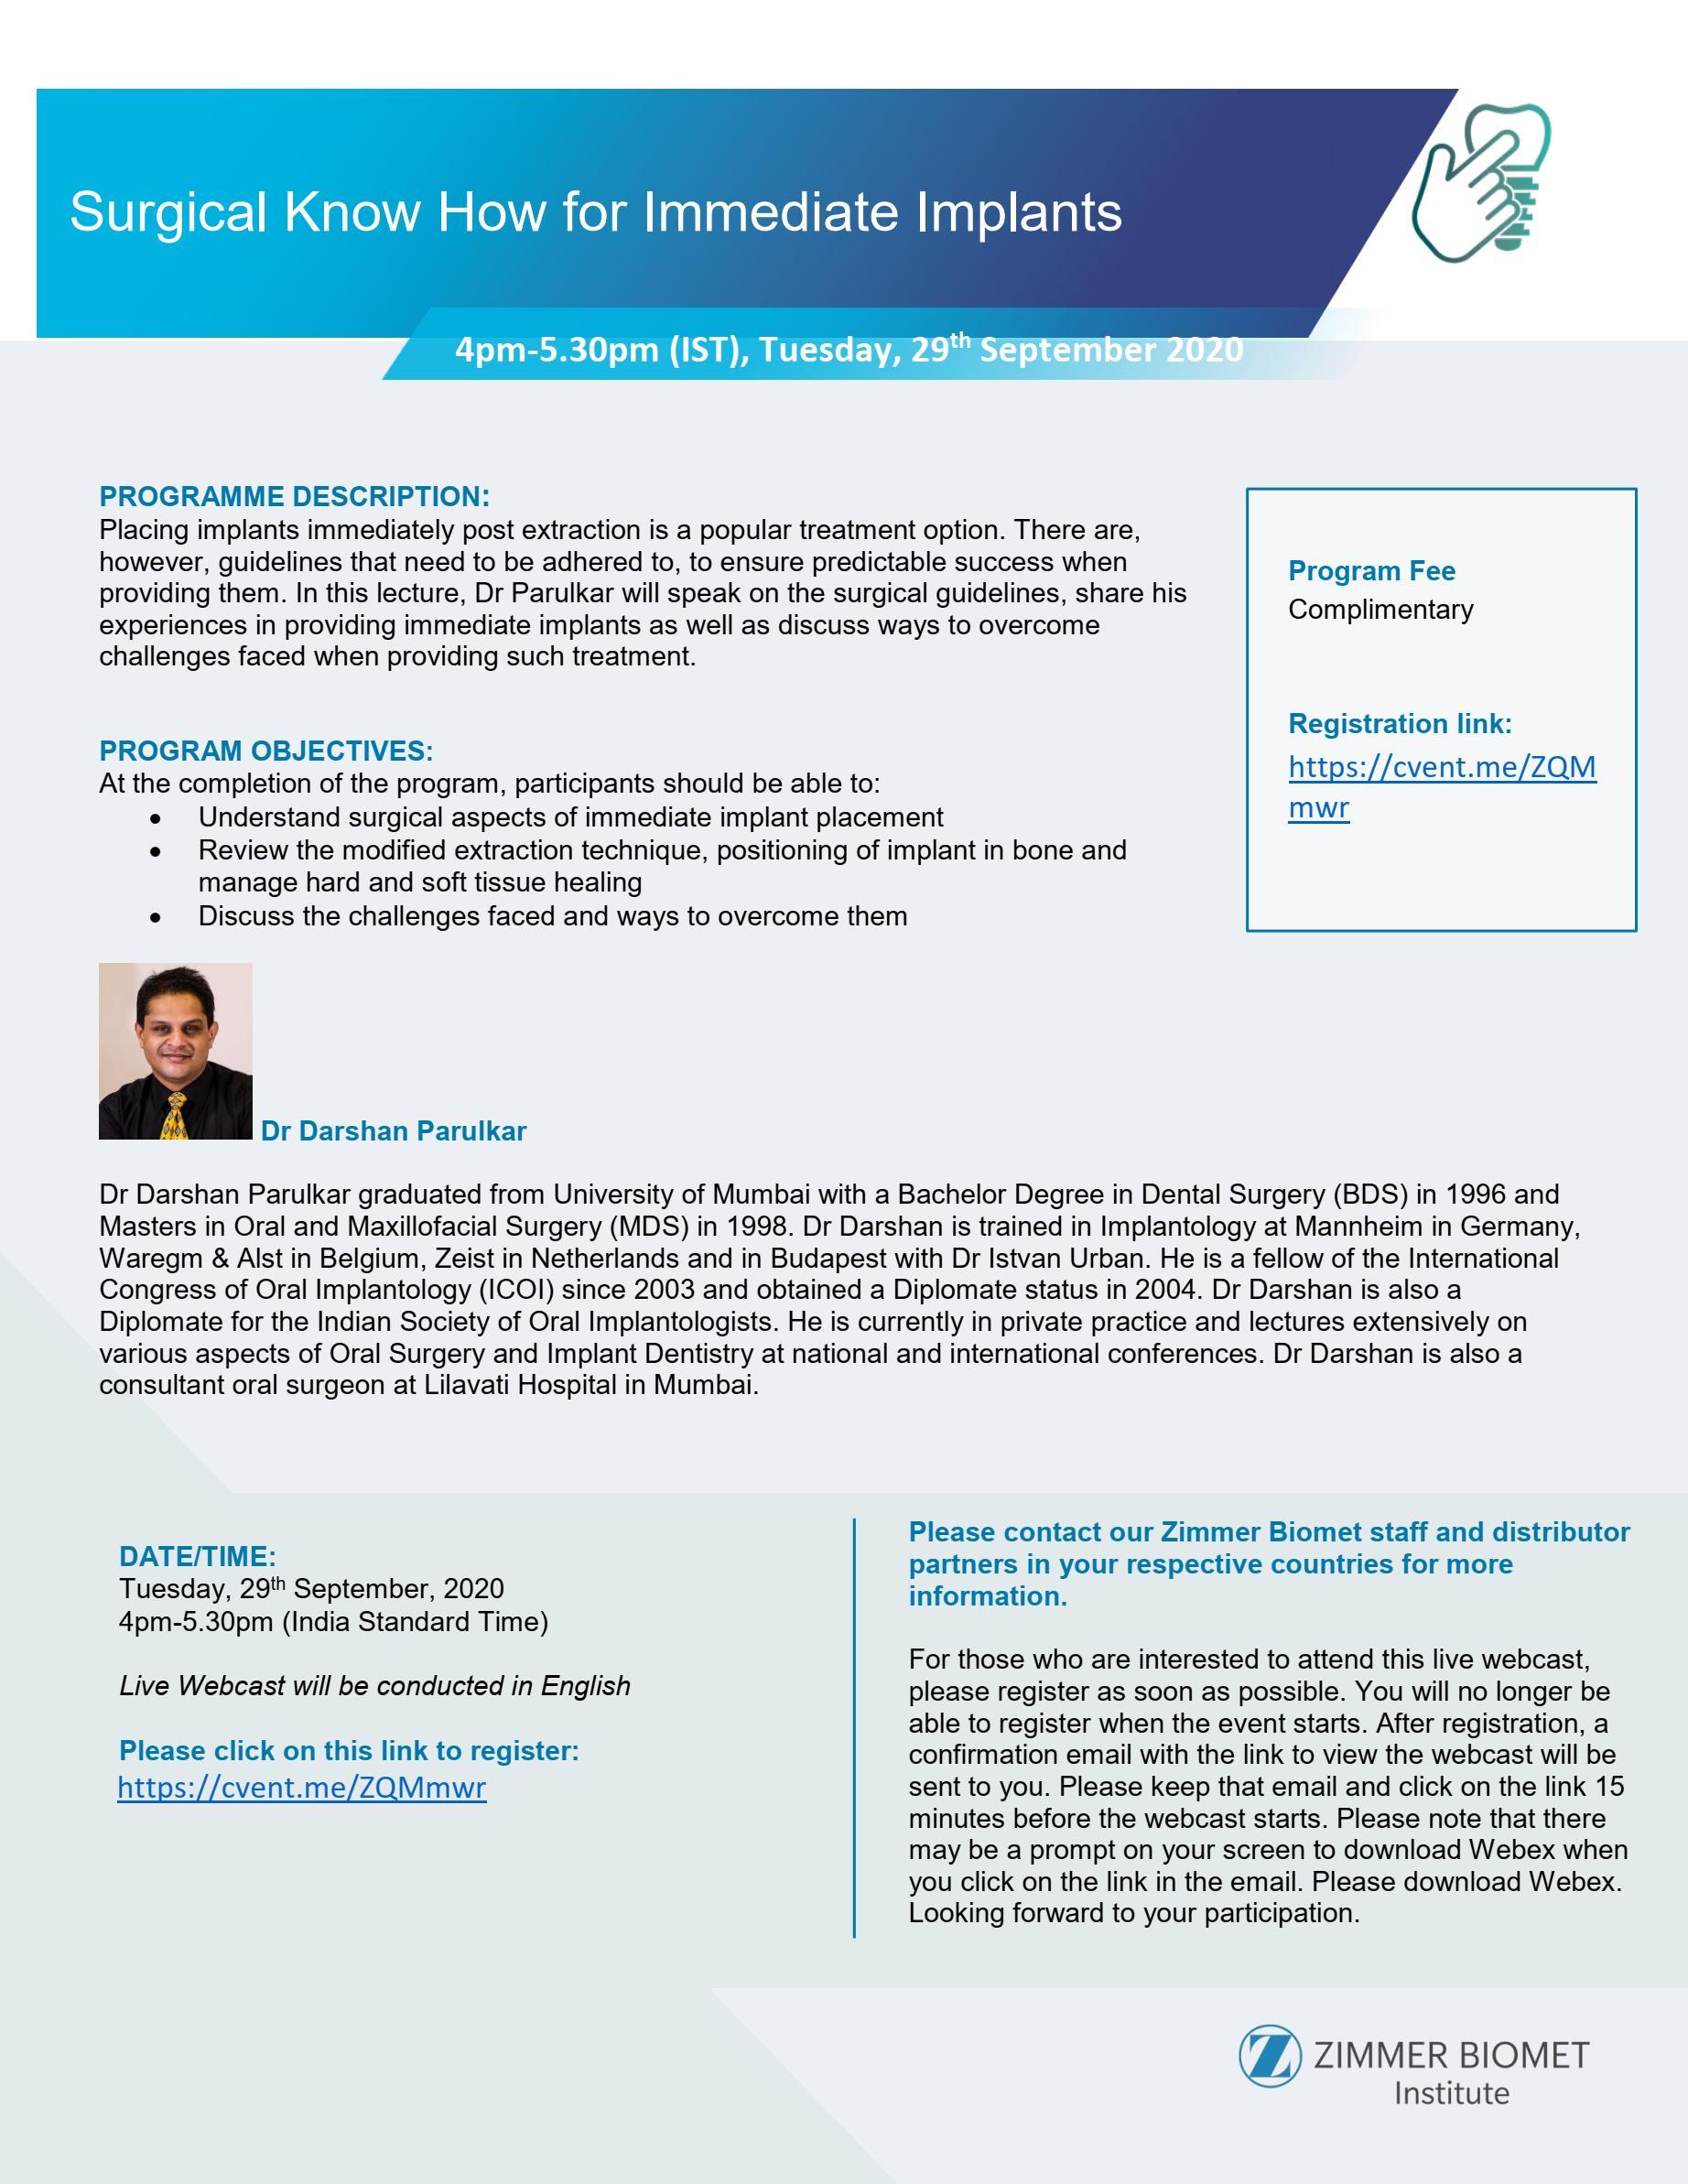 Webinar-Dr.Darshan-Parulkar-29-09-2020